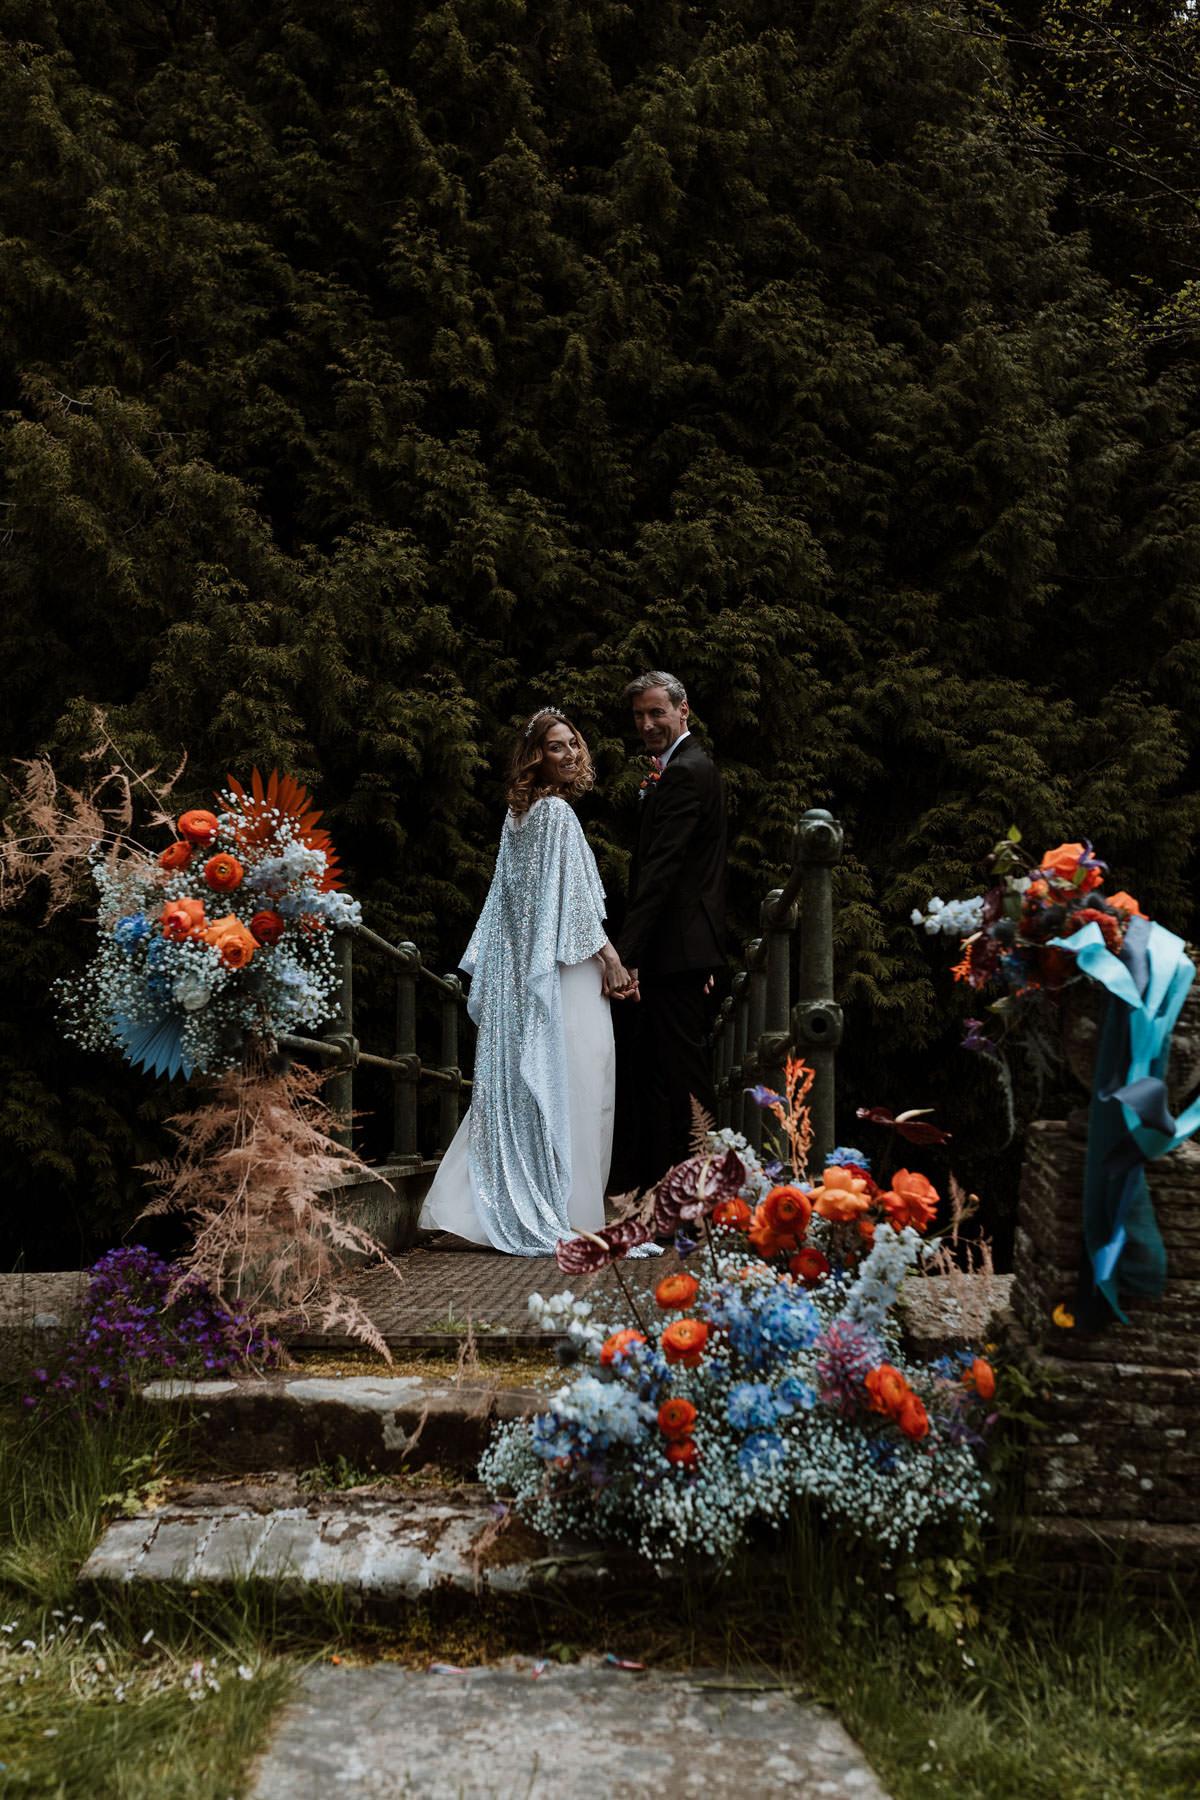 disco wedding, elopement, elopement ceremony, festival bride, festival wedding, floral boat, pix by vix, retro inspired wedding, sequin cape, wild disco theme, wilde posies, woodland elopement